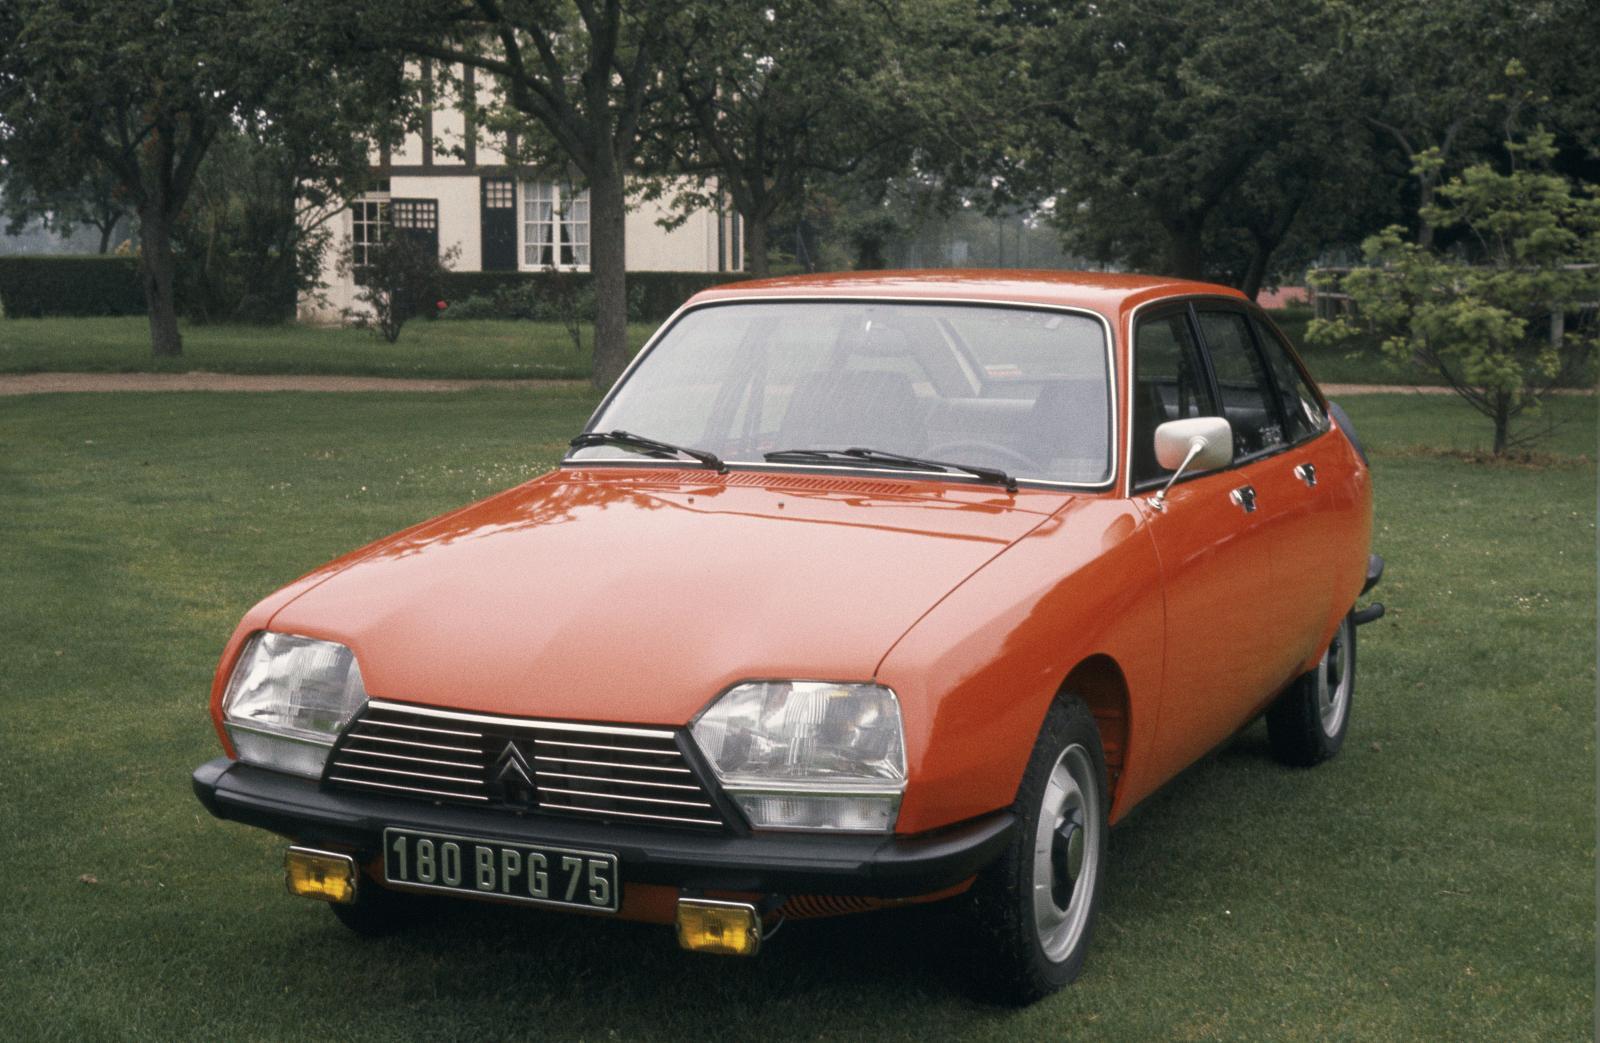 GS X 1978